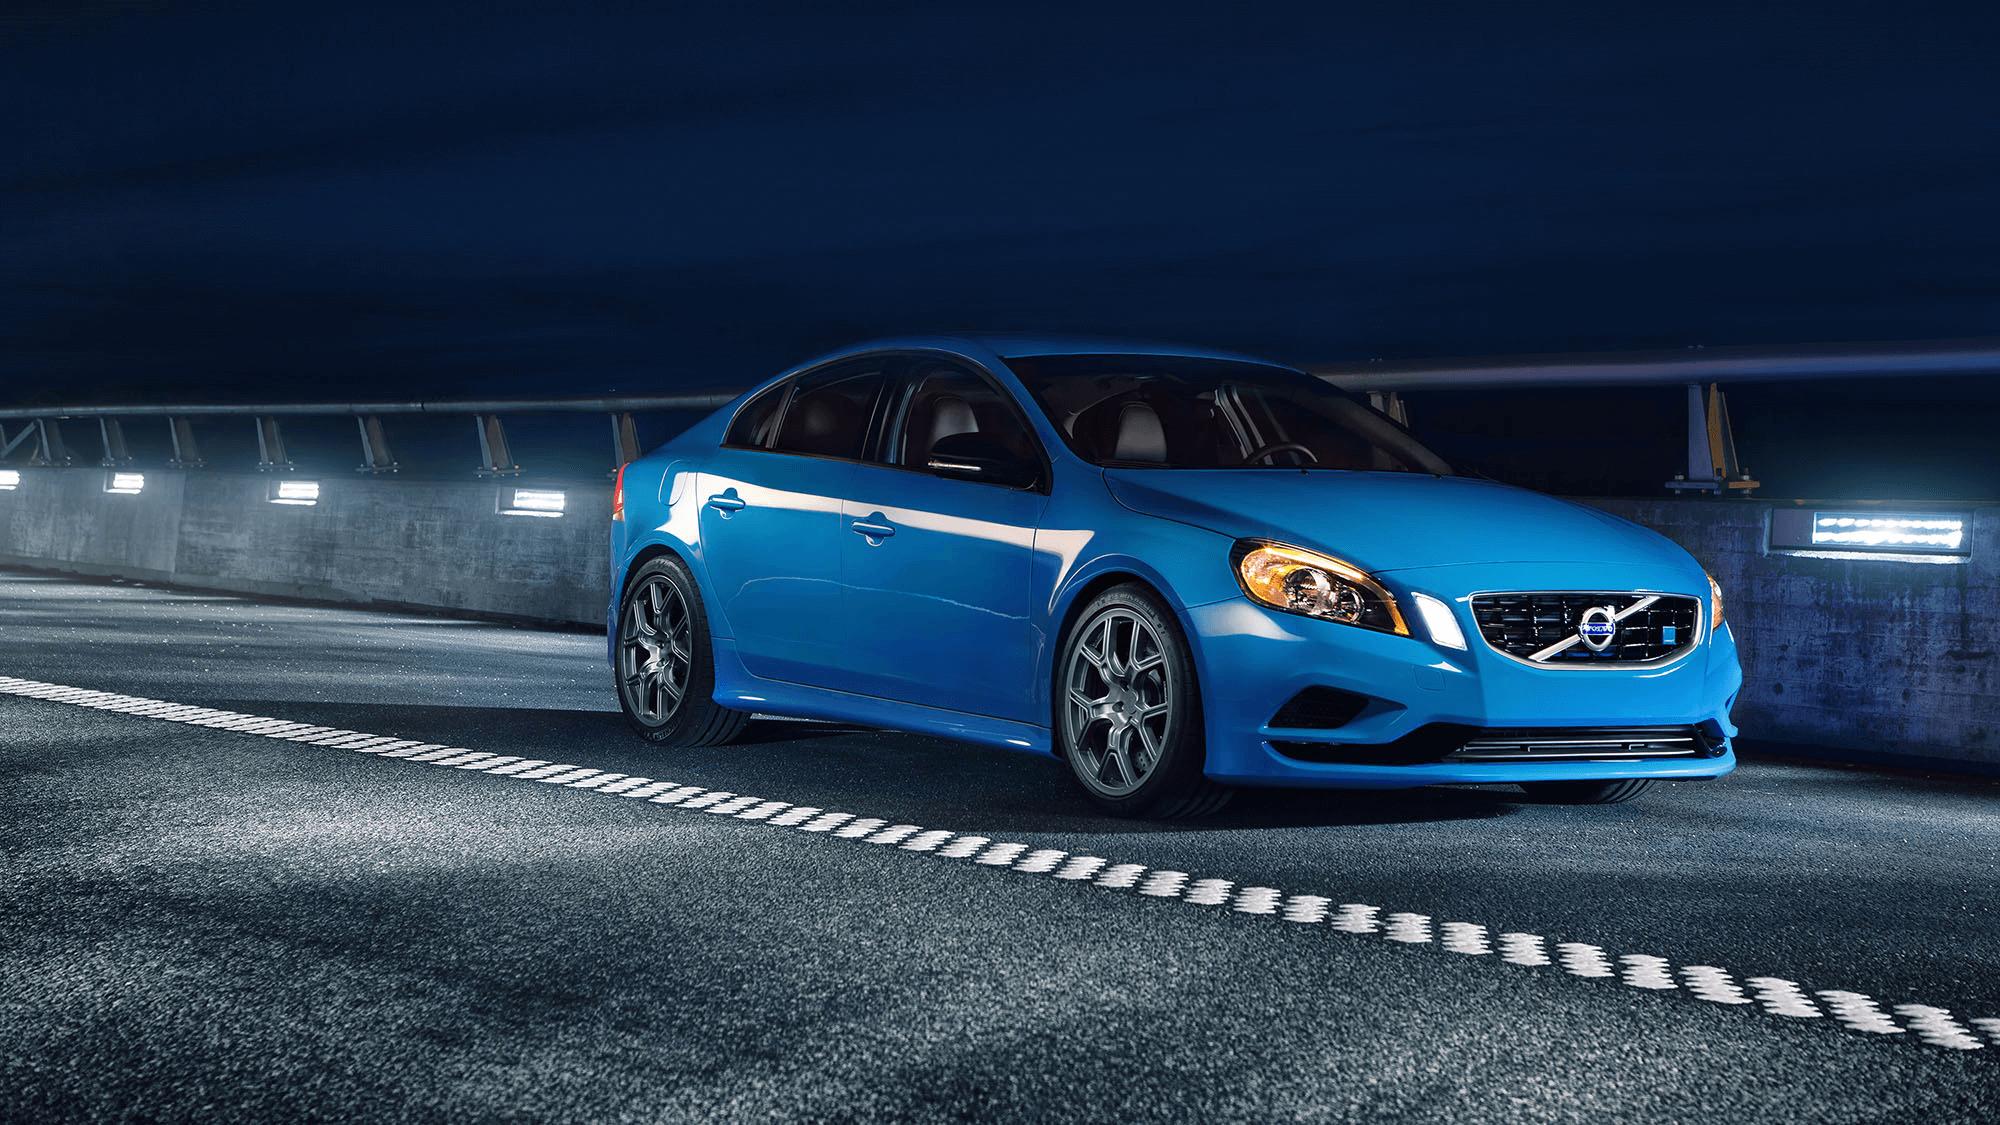 S60 T6, 2.0-litre petrol engine, Volvo, Polestar, S60, XC90, XC60,